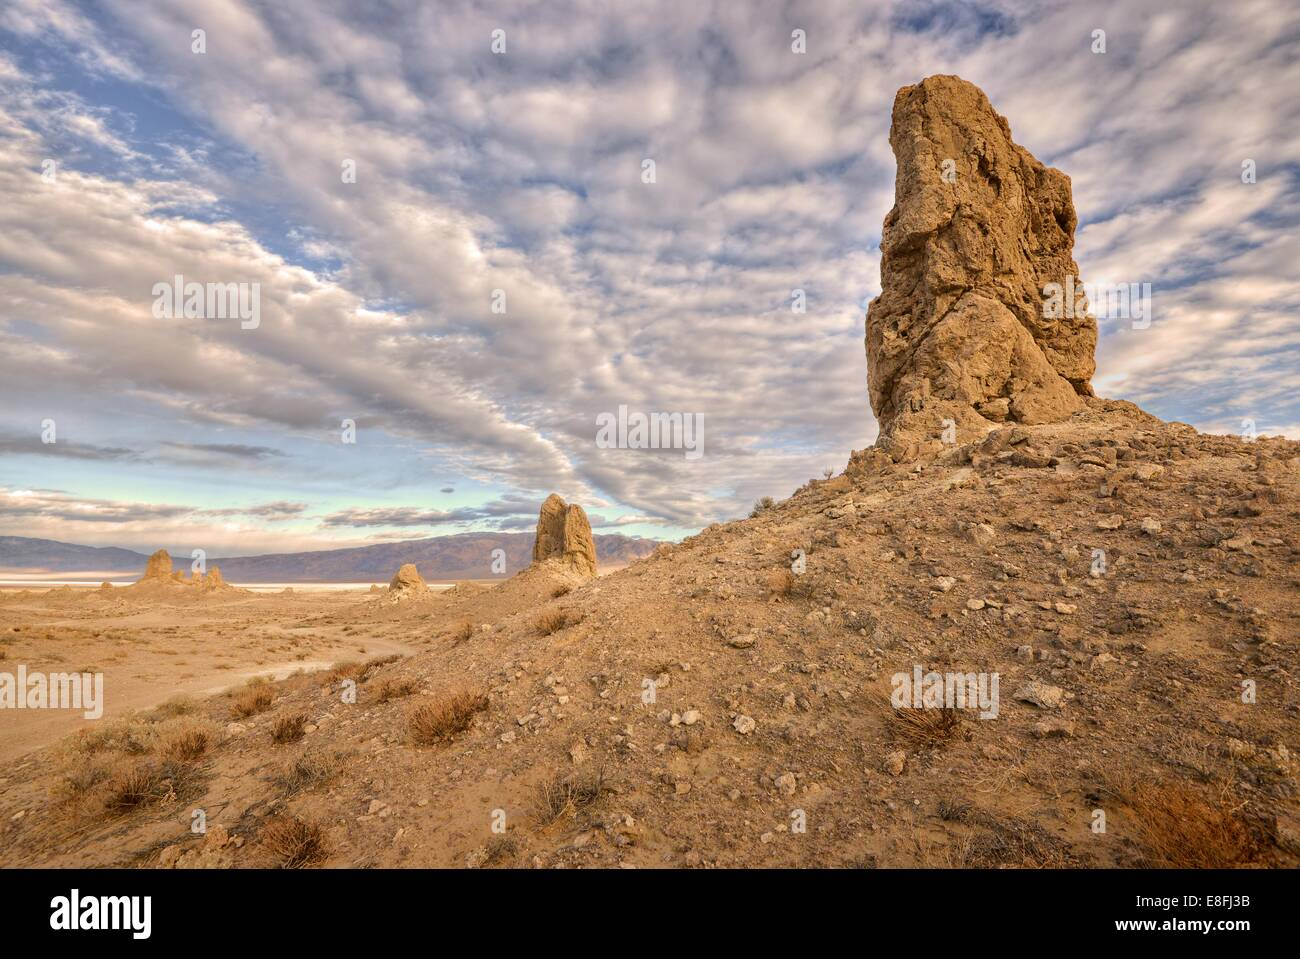 USA, California, Trona, View of Pinnacles National Natural Landmark - Stock Image